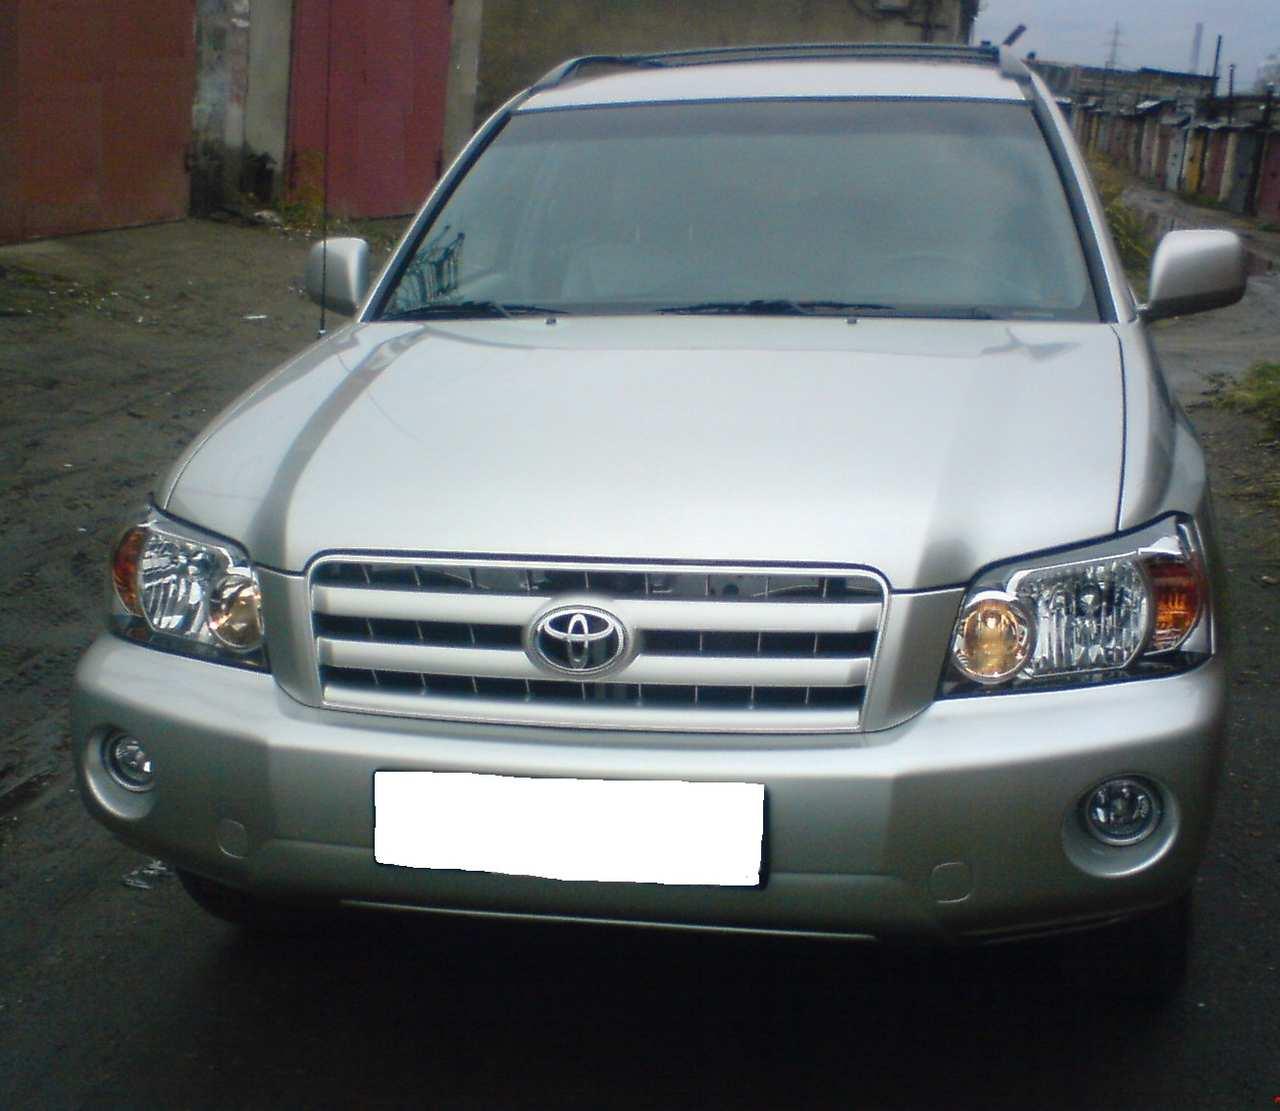 Toyota Highlander Reviews: 2005 Toyota Highlander Pictures, Gasoline, FF, Automatic